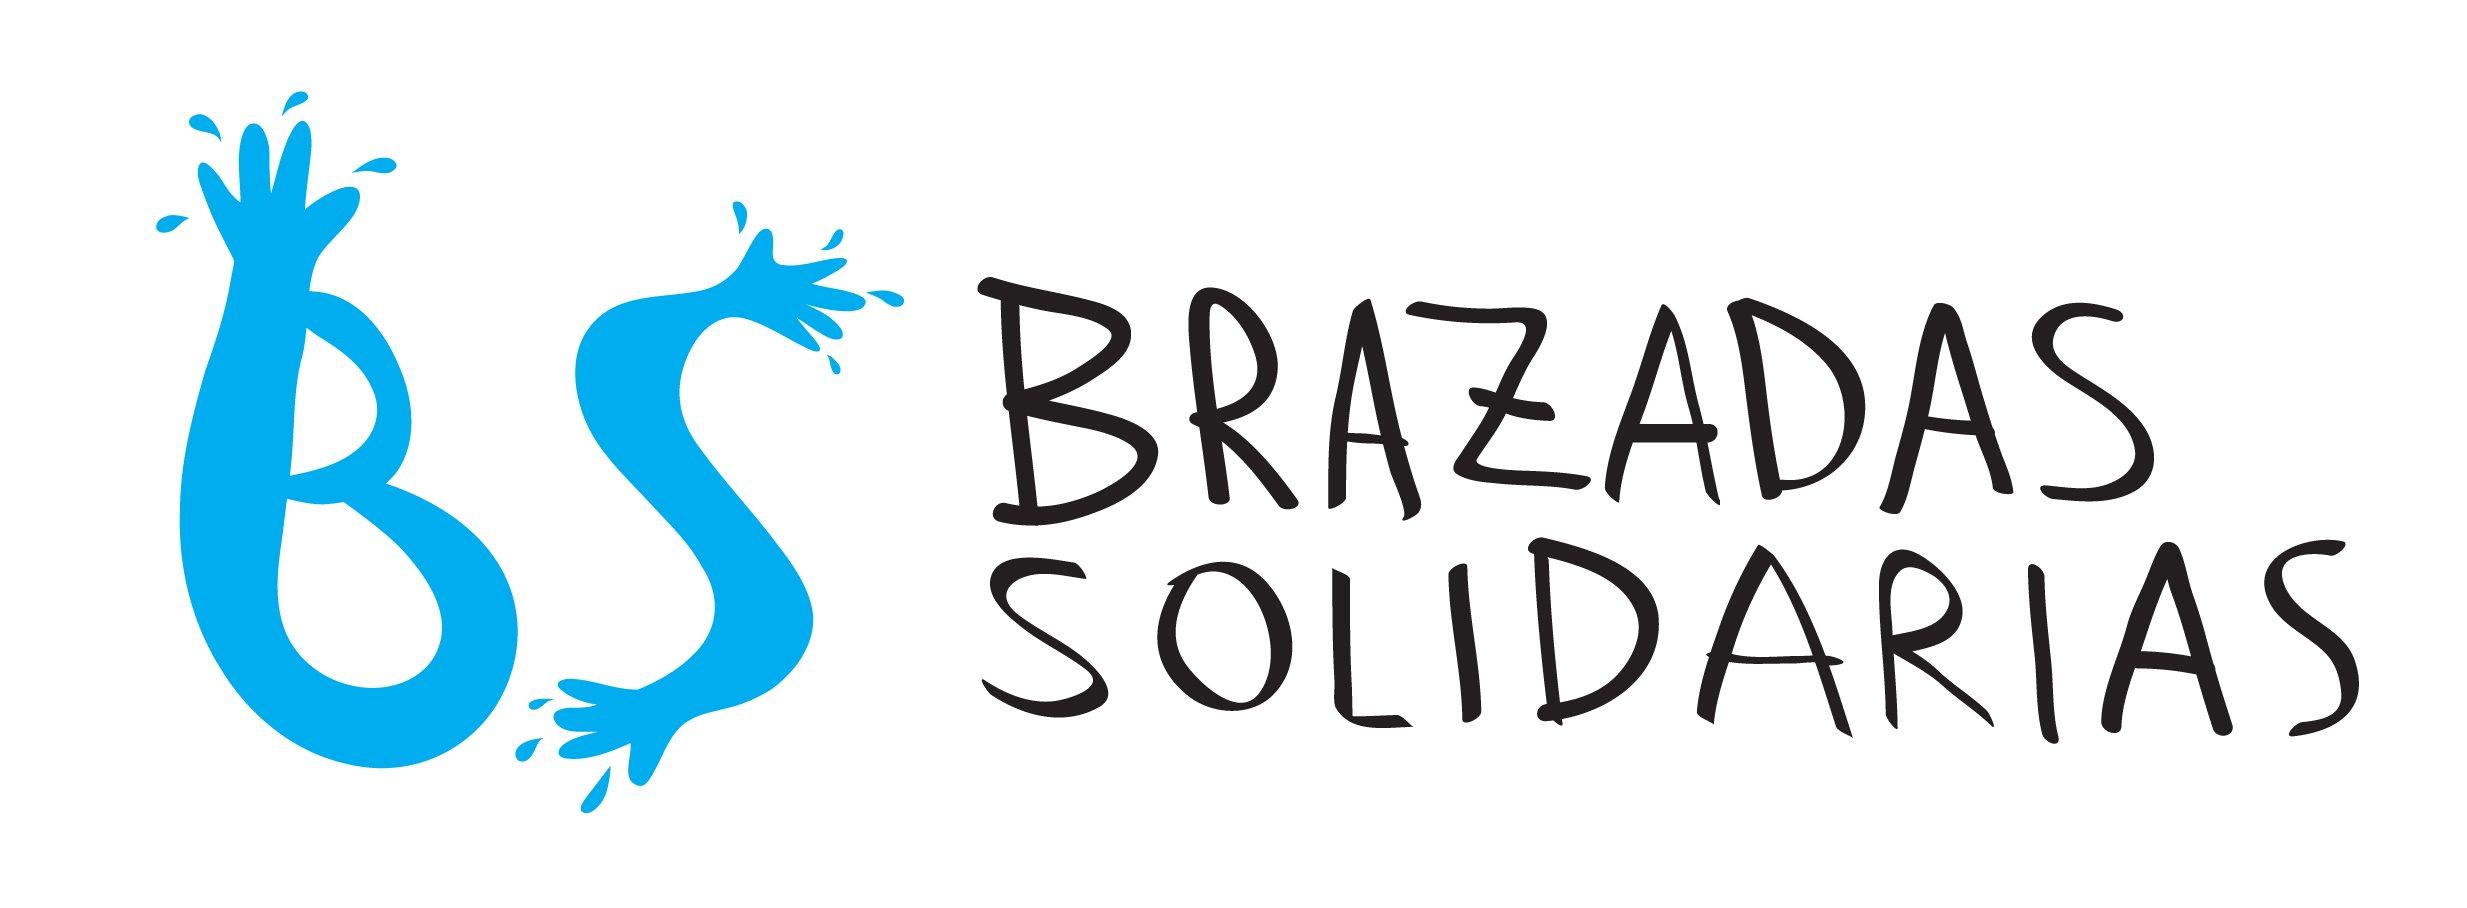 brazadas-solidarias-logo